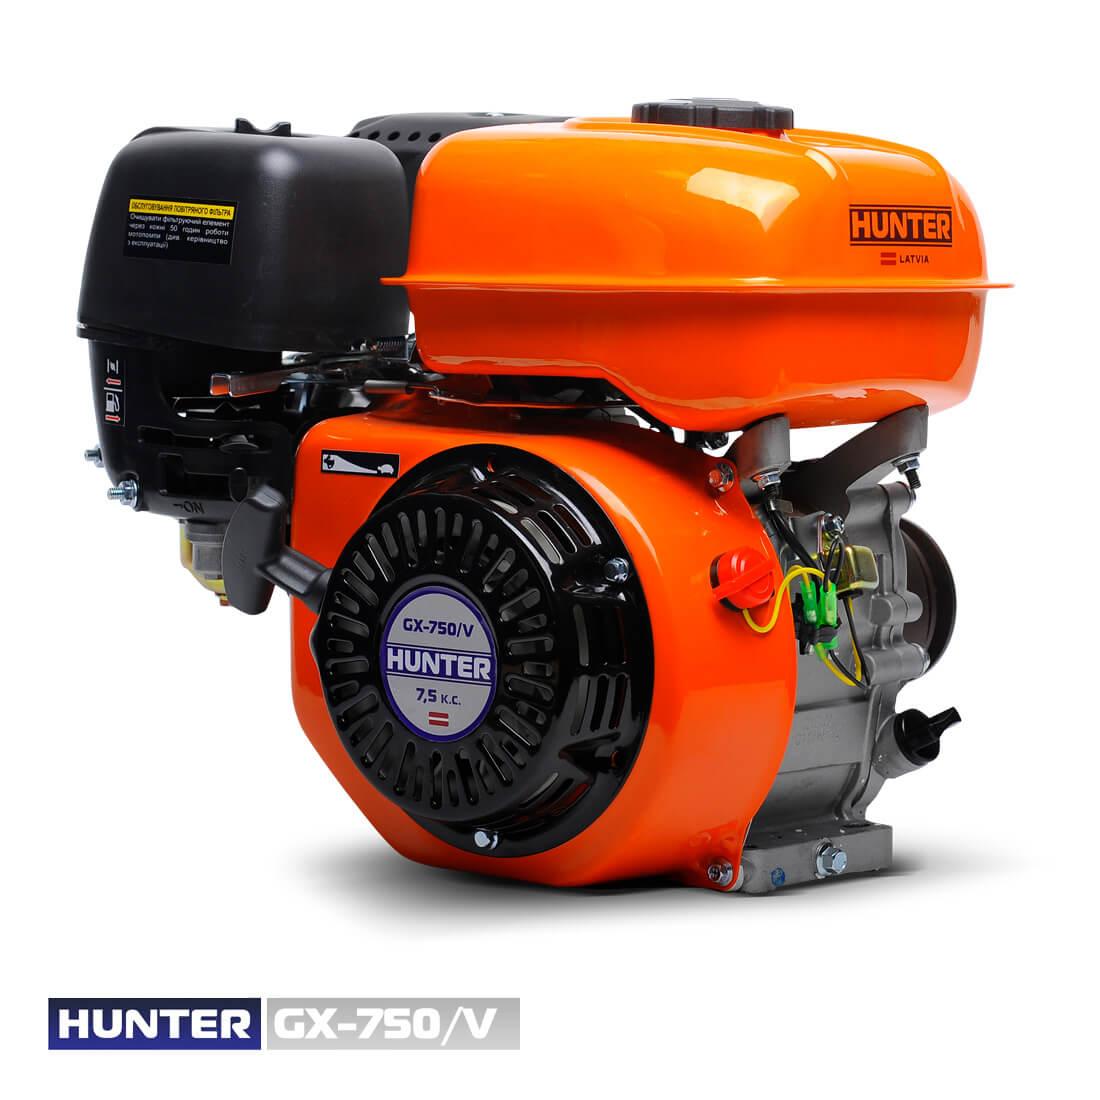 Фото GX-750/V цена 5000грн №1 — Hunter